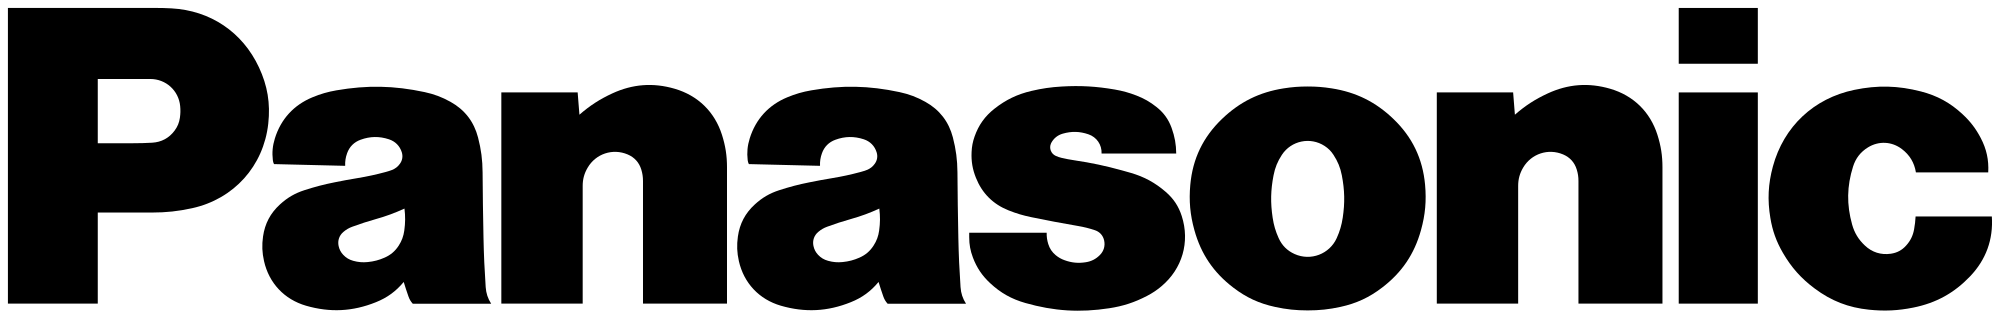 Open PlusPng.com  - Panasonic PNG